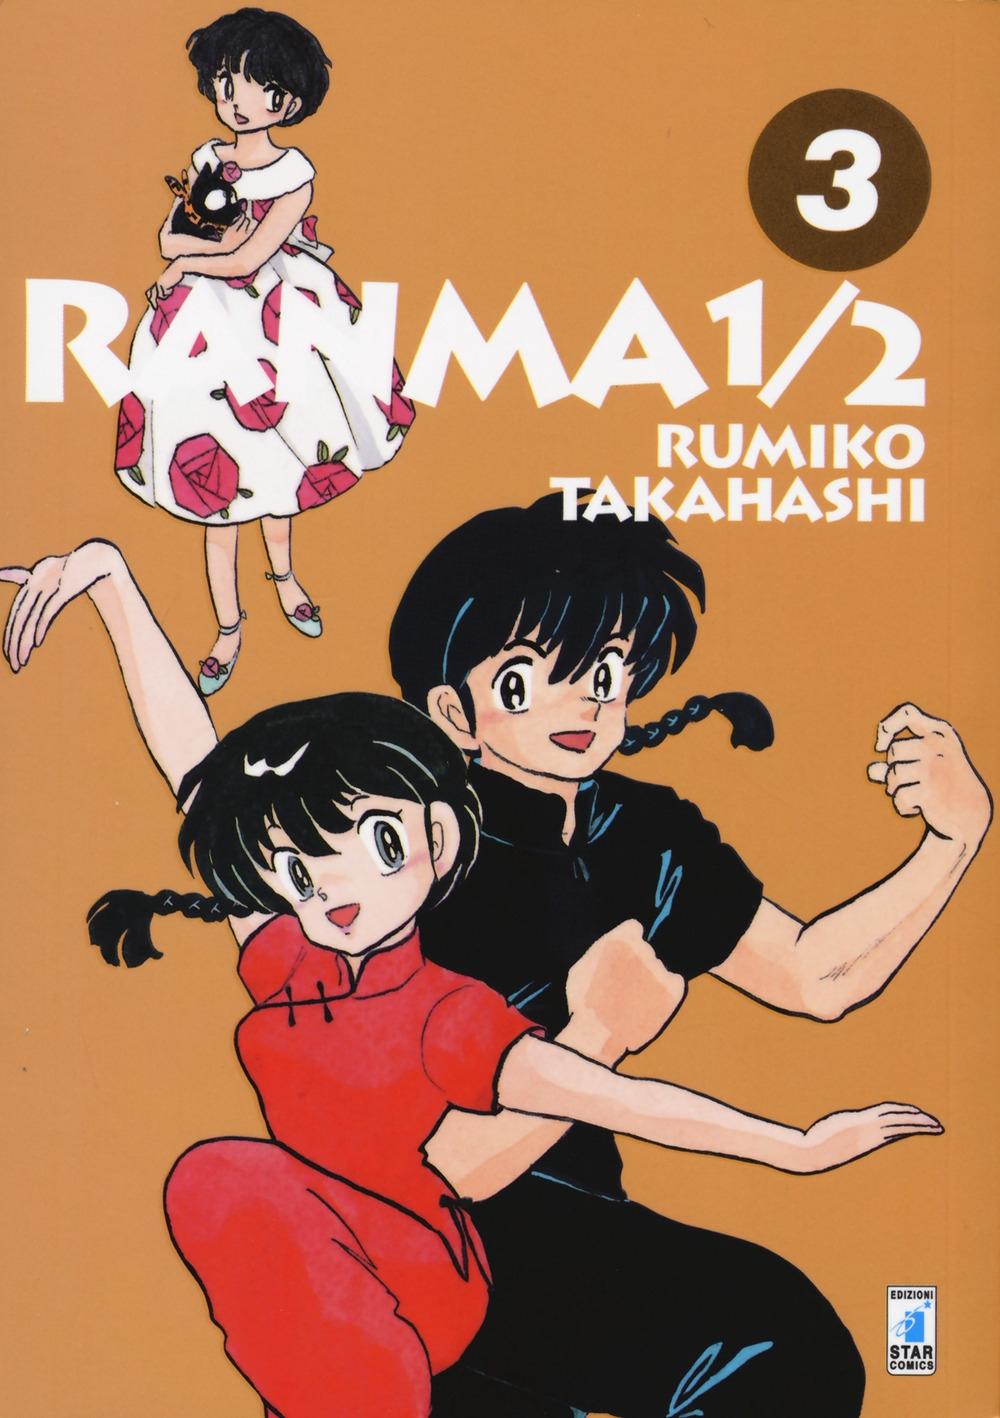 Ranma ½. New edition. Vol. 3